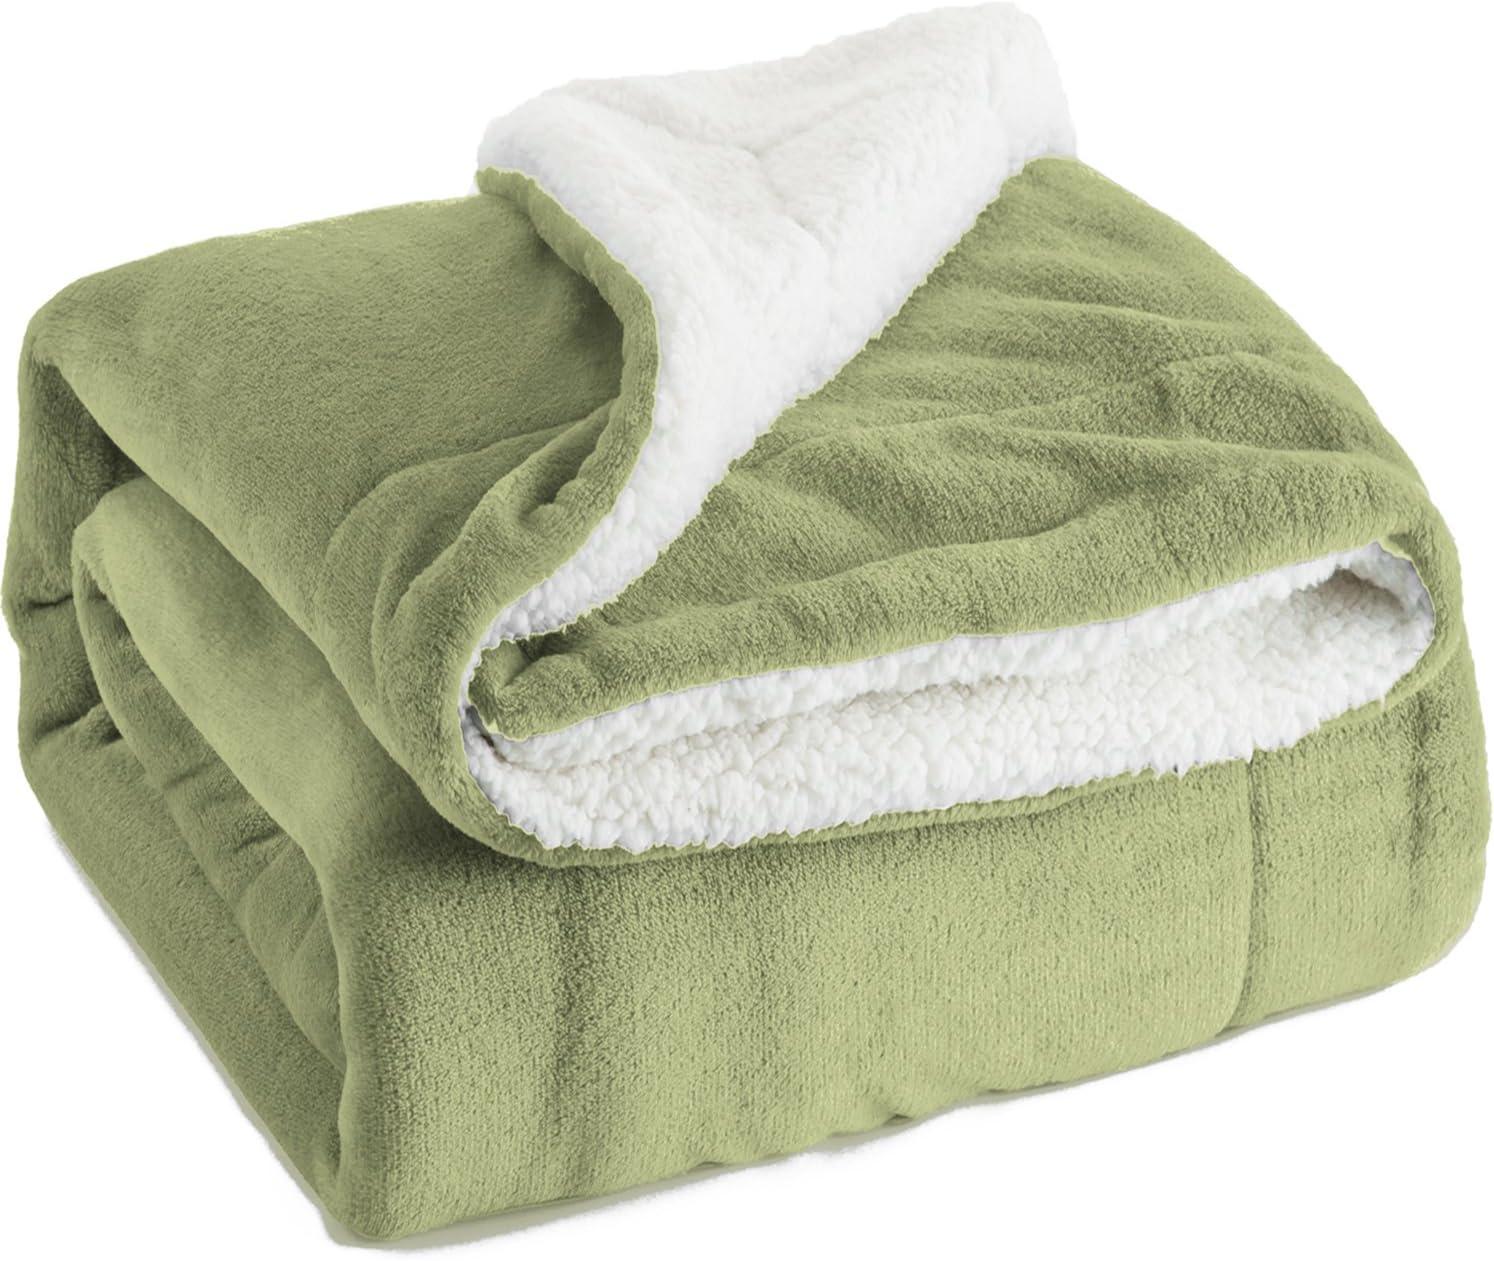 Bedsure Sherpa Fleece Blanket Twin Size Sage Green Plush Blanket Fuzzy Soft Blanket Microfiber